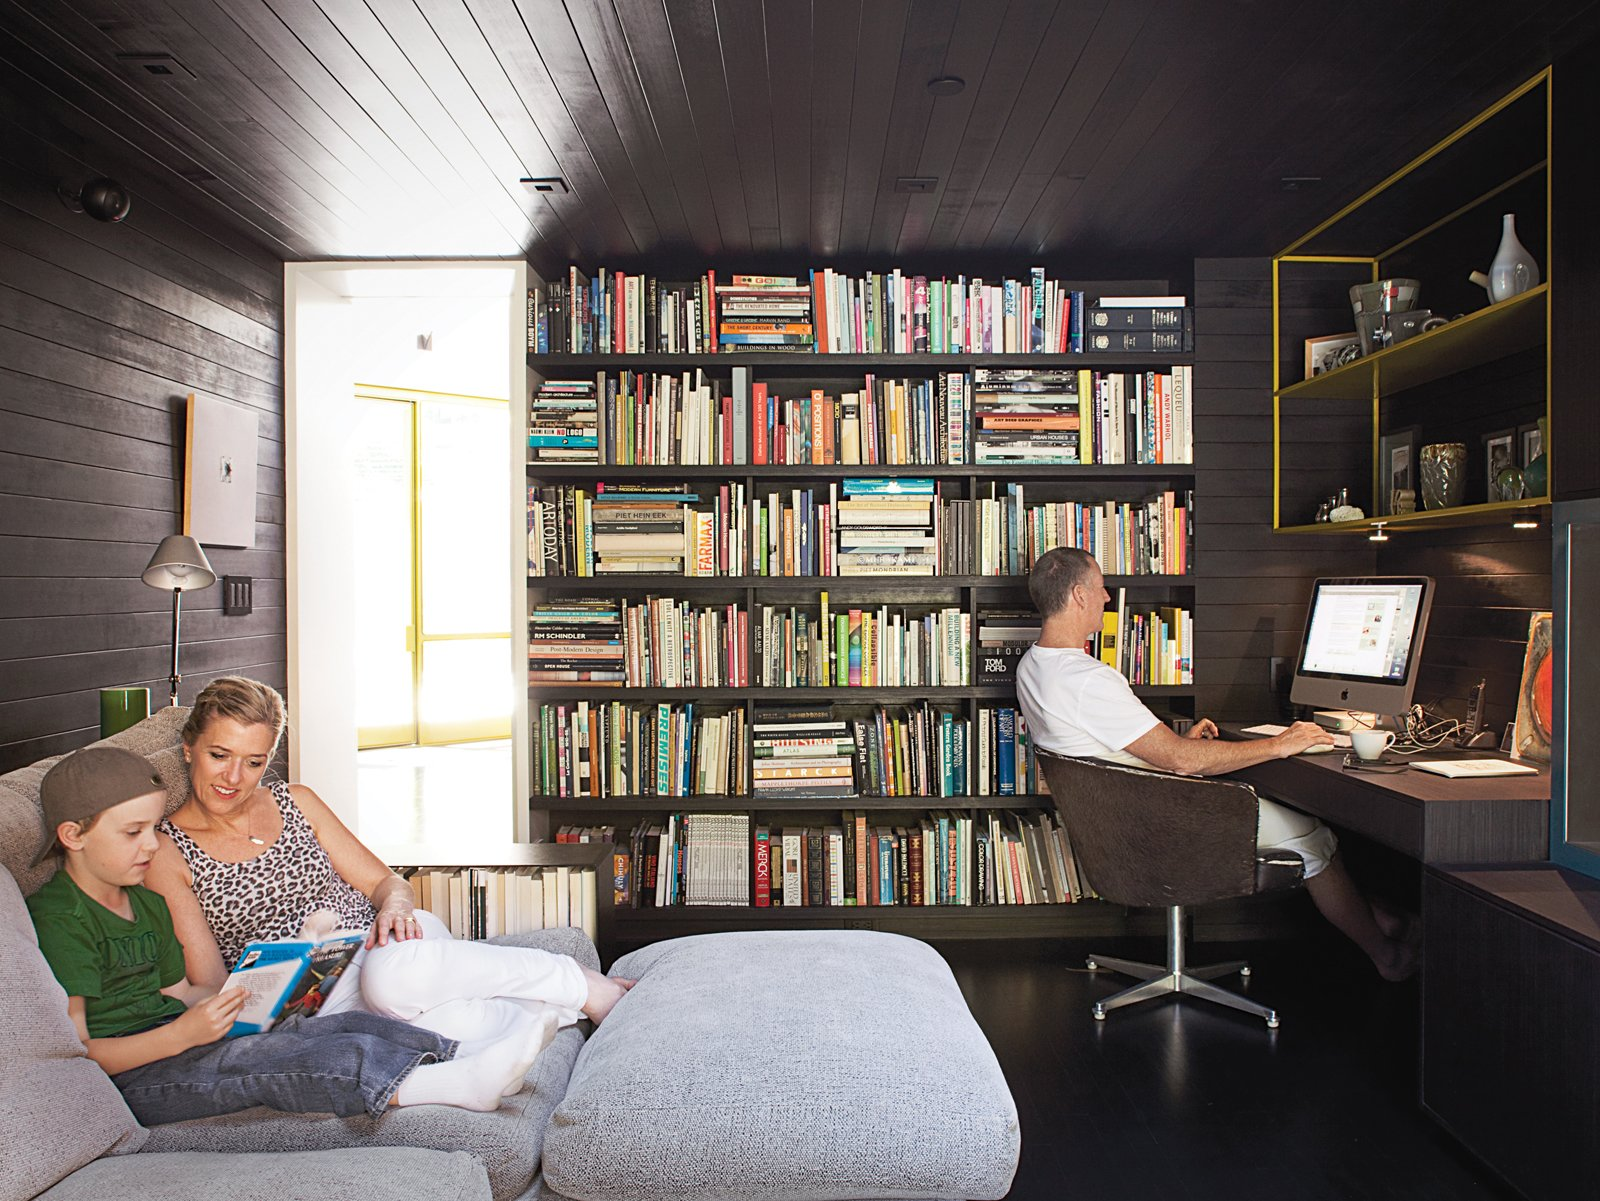 TV room/library  The Deam House by Lara Deam